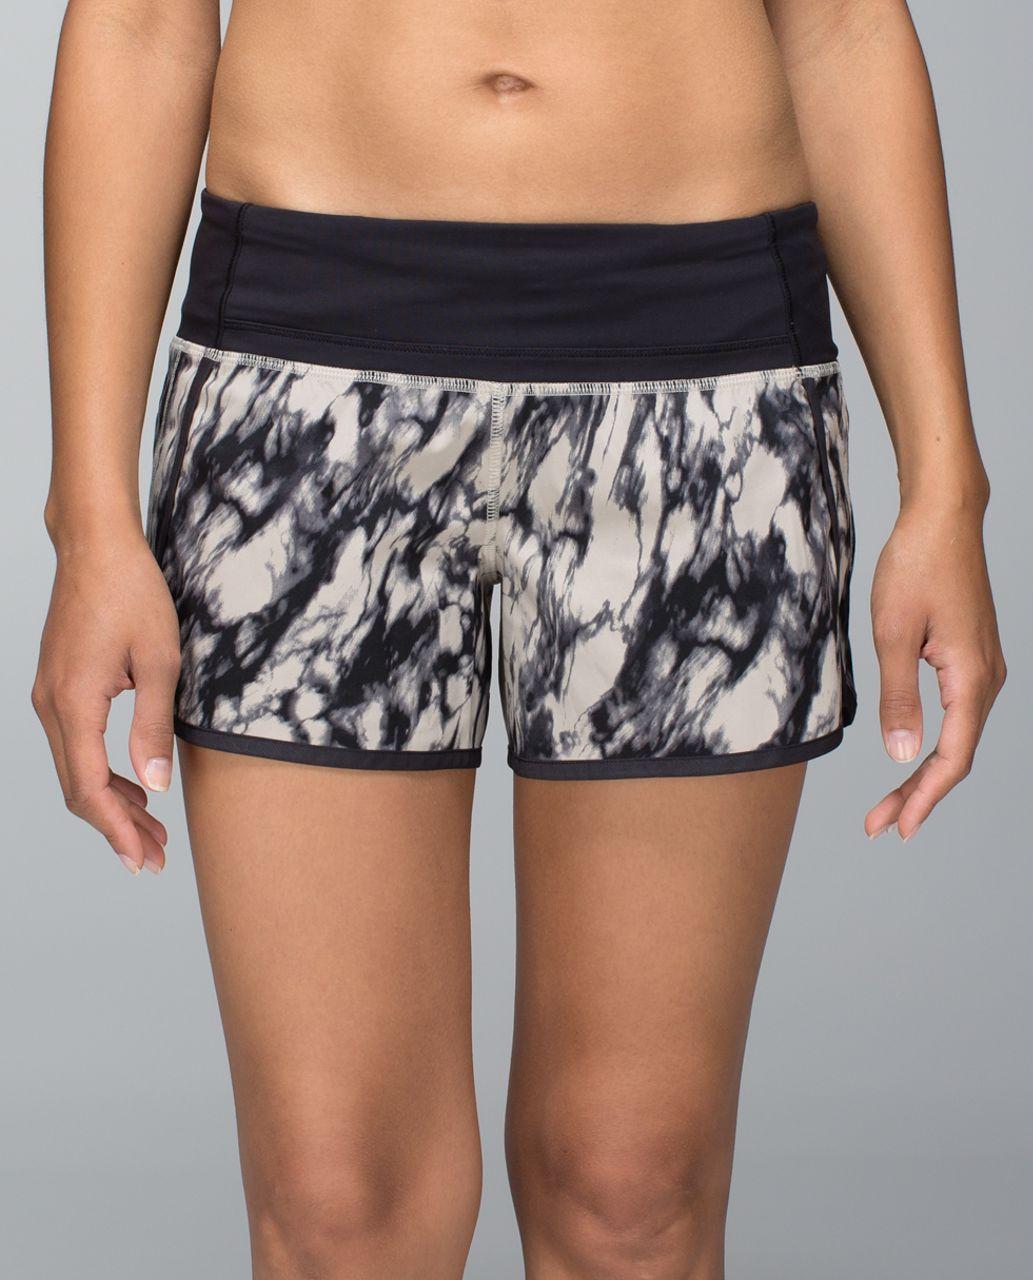 Lululemon Run Times Short *4-way stretch - Great Granite Black Mojave Tan / Black